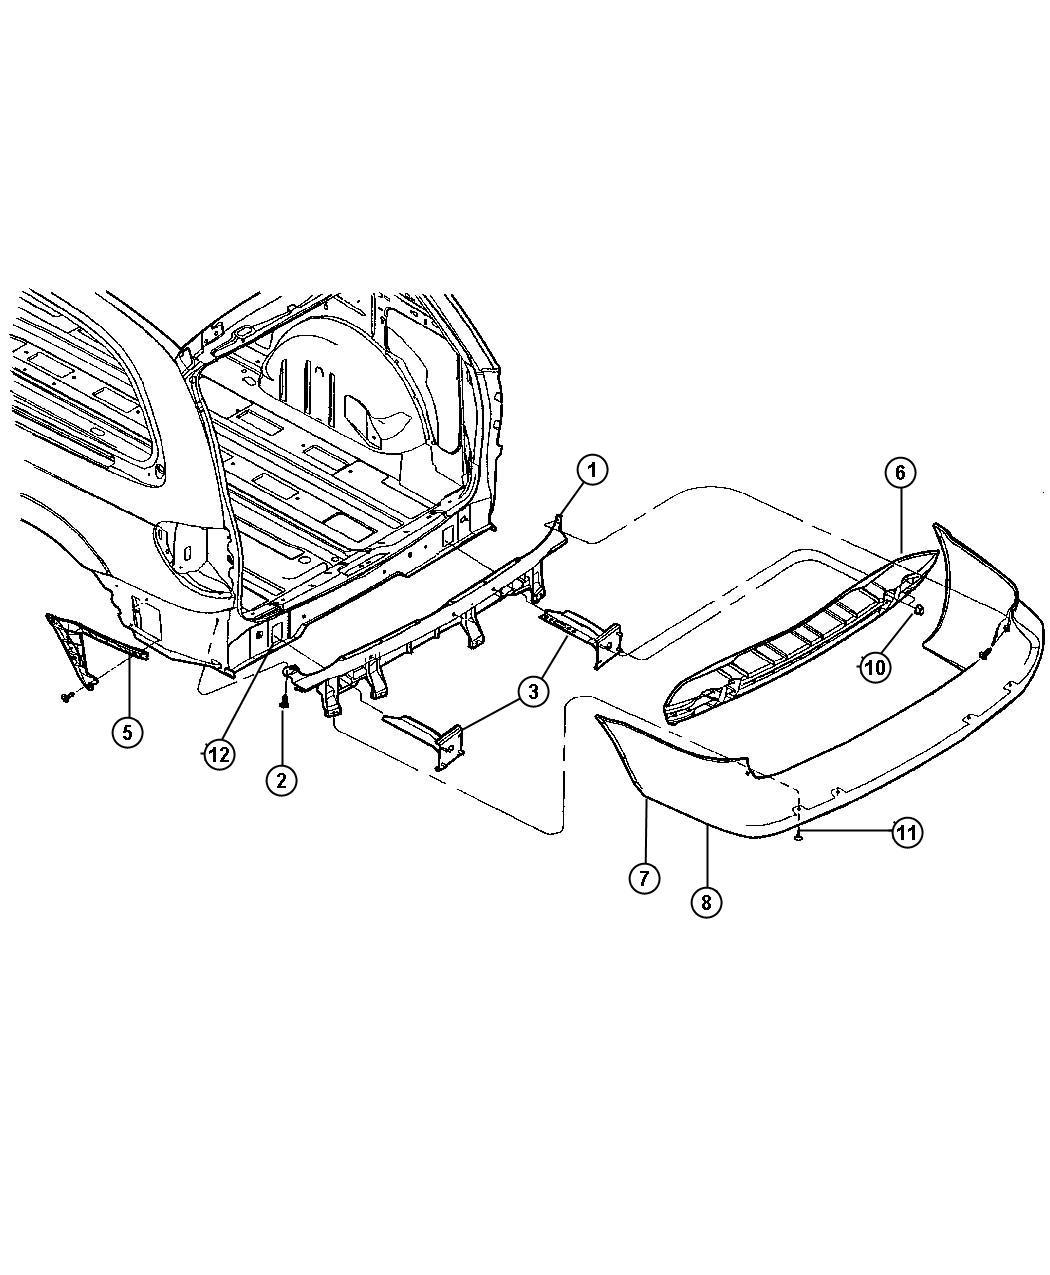 2001 Dodge Grand Caravan Reinforcement  Rear Bumper